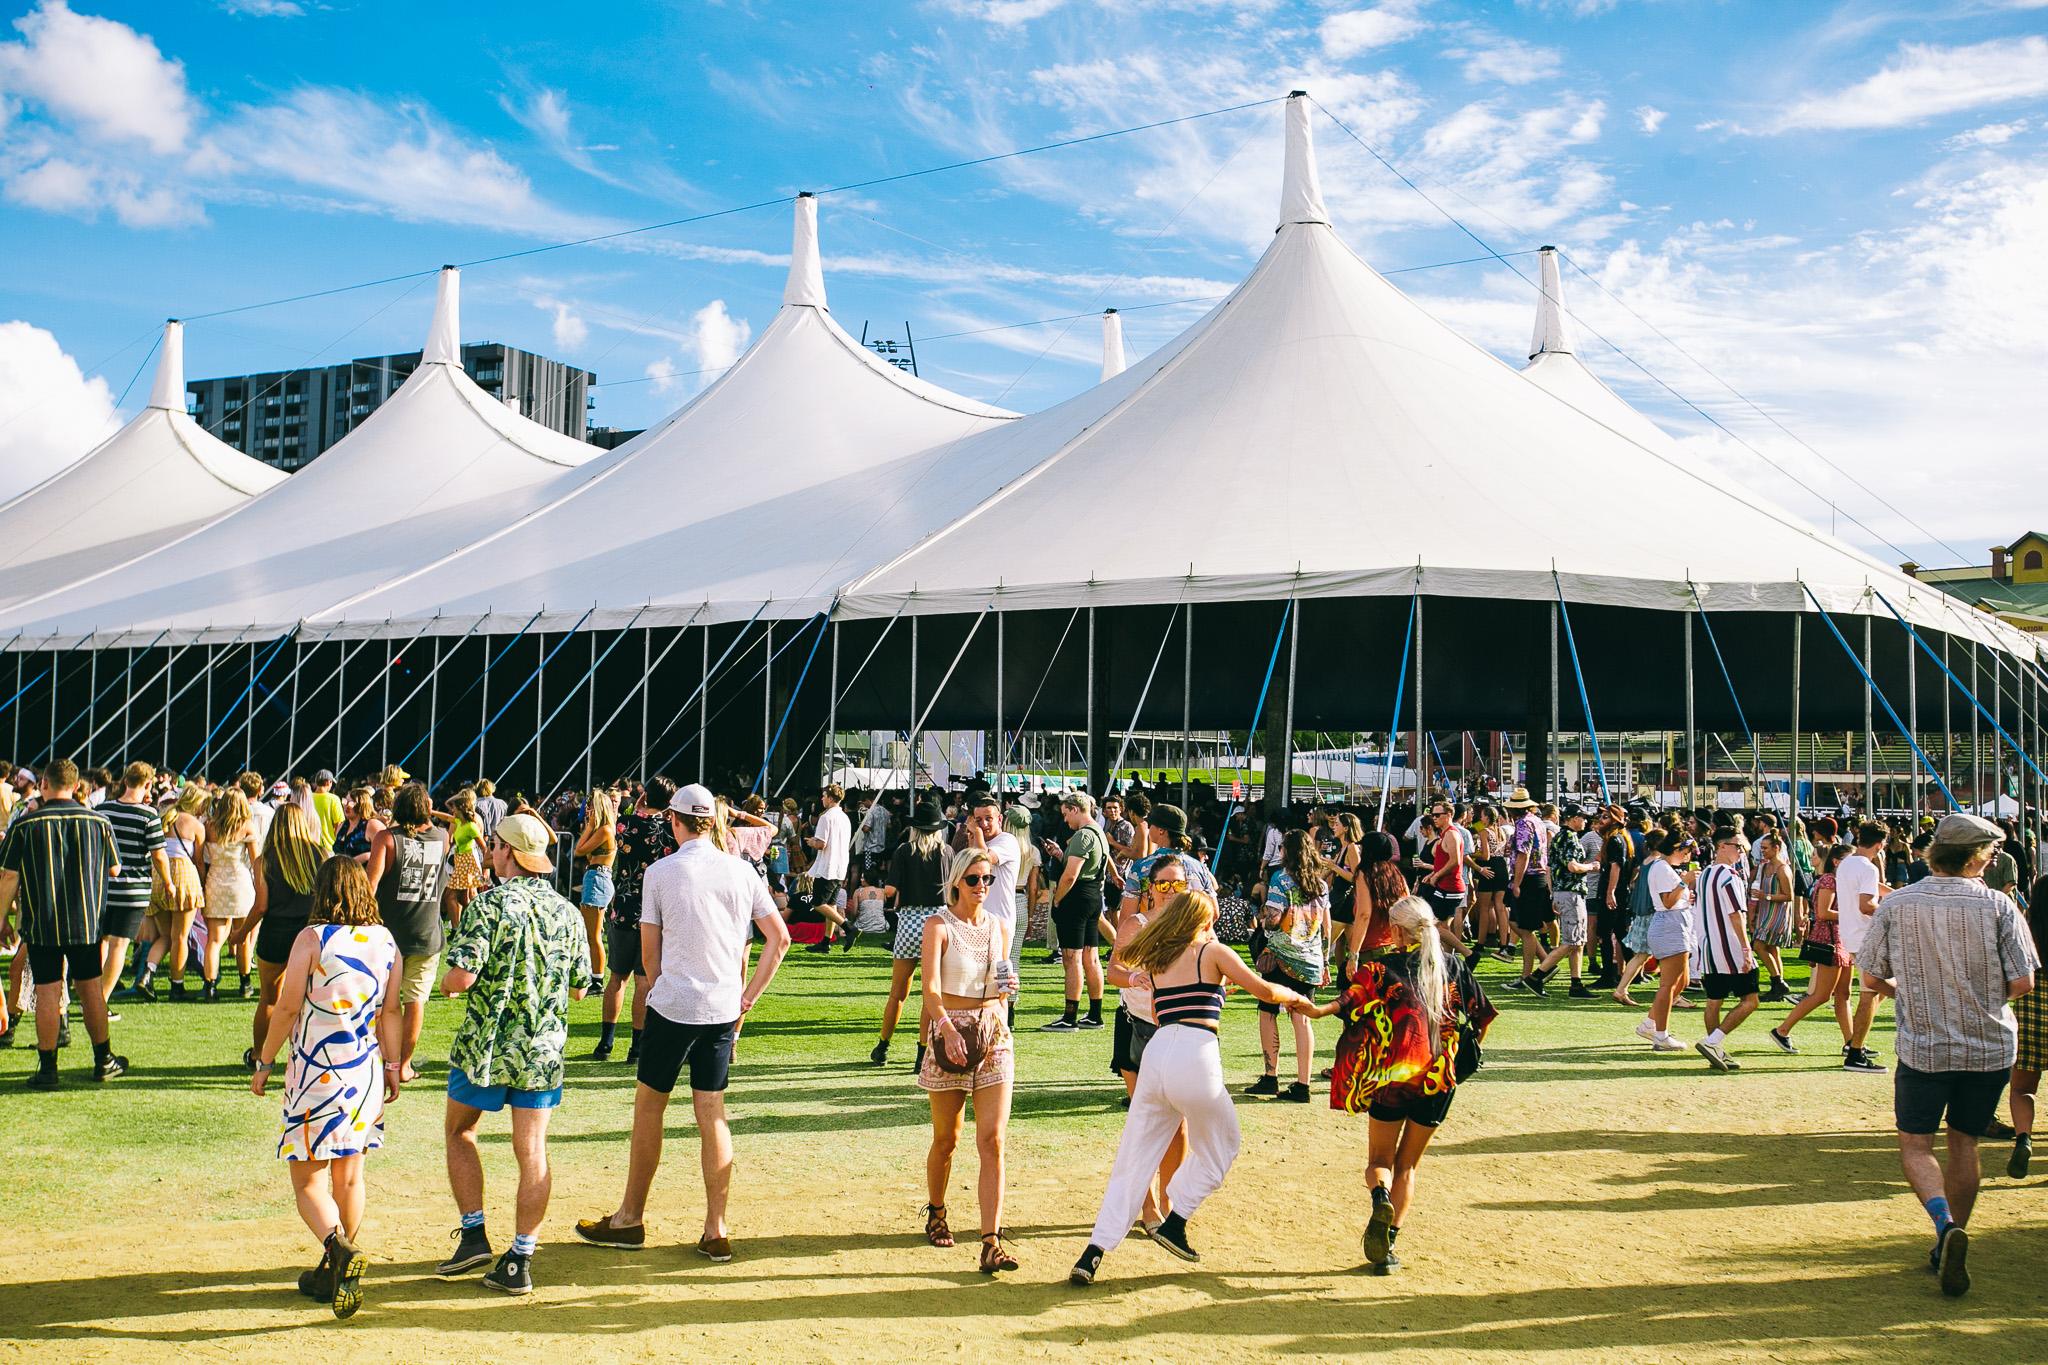 Atmosphere - Stage - Landmarks_Laneway Brisbane 2019_Bianca Holderness-41.jpg